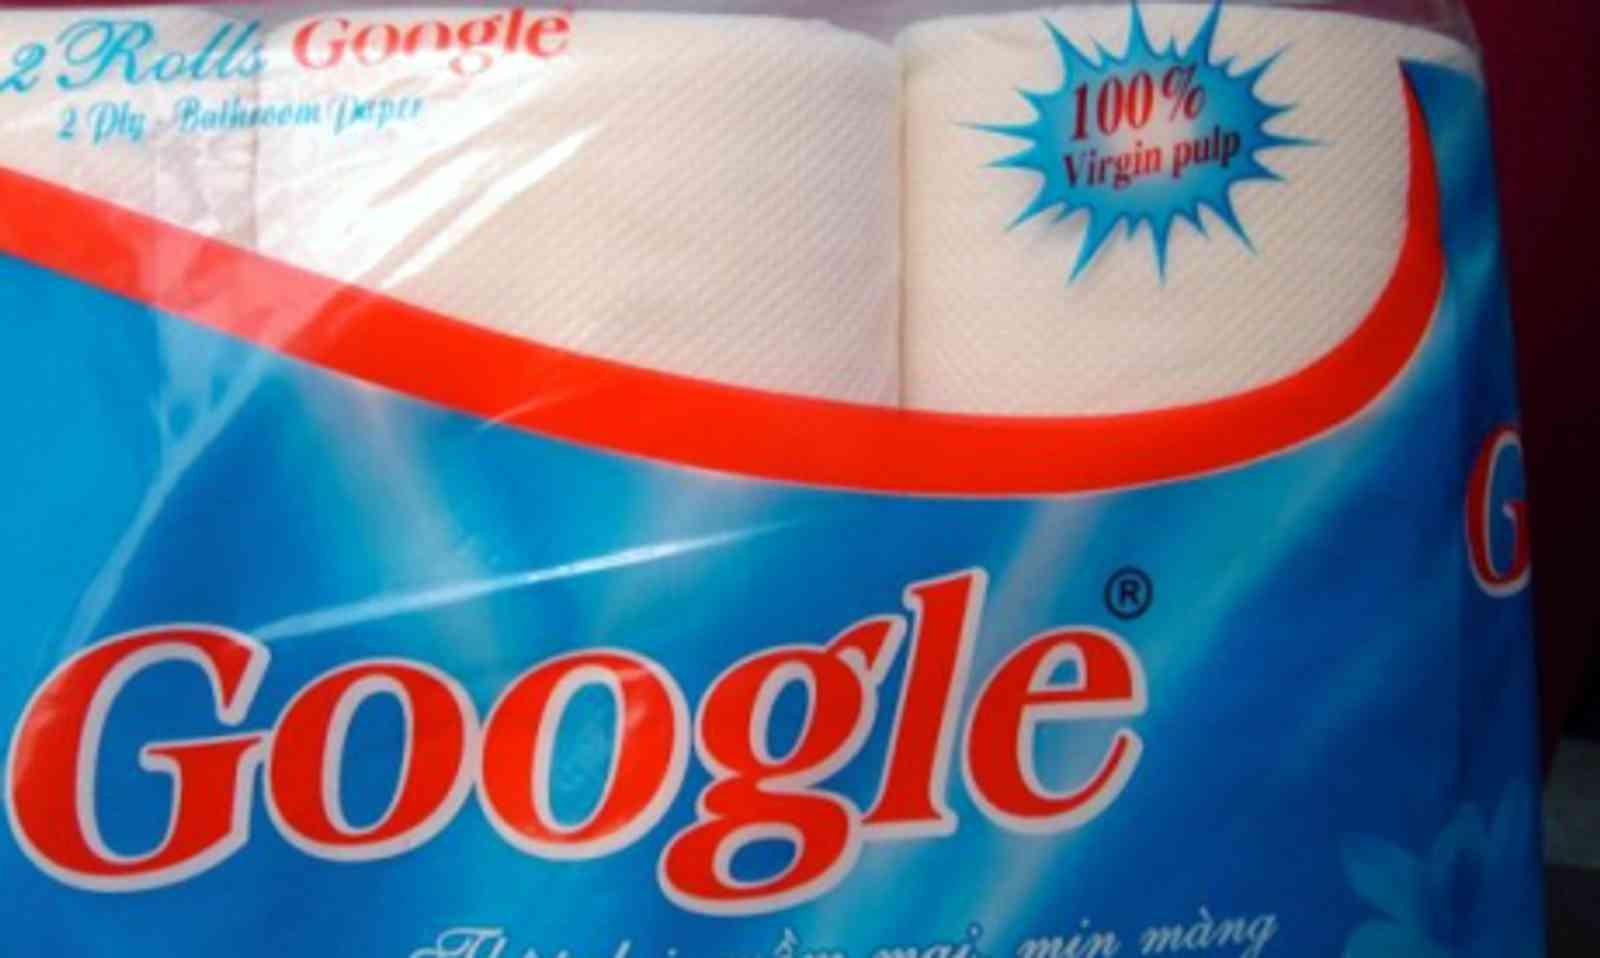 Google toilet paper, Vietnam